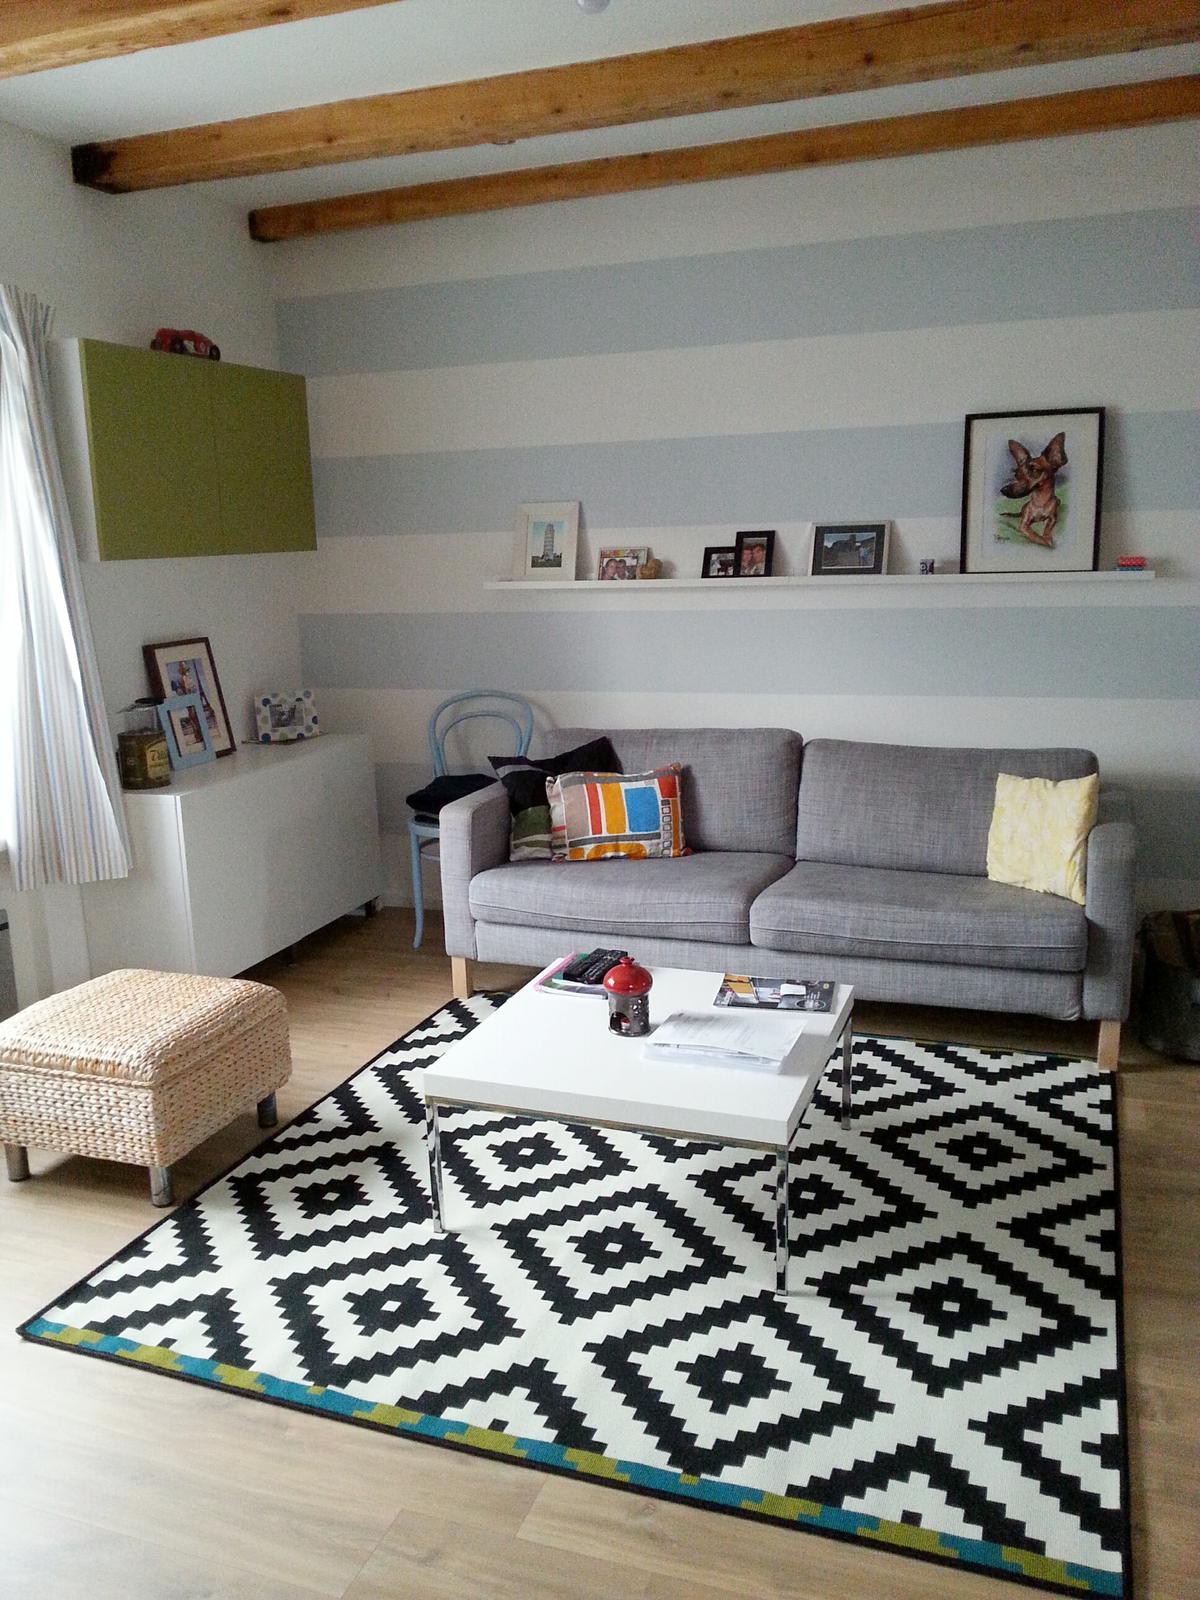 U nás - v malom dome :-) - nas novy koberec ;-)